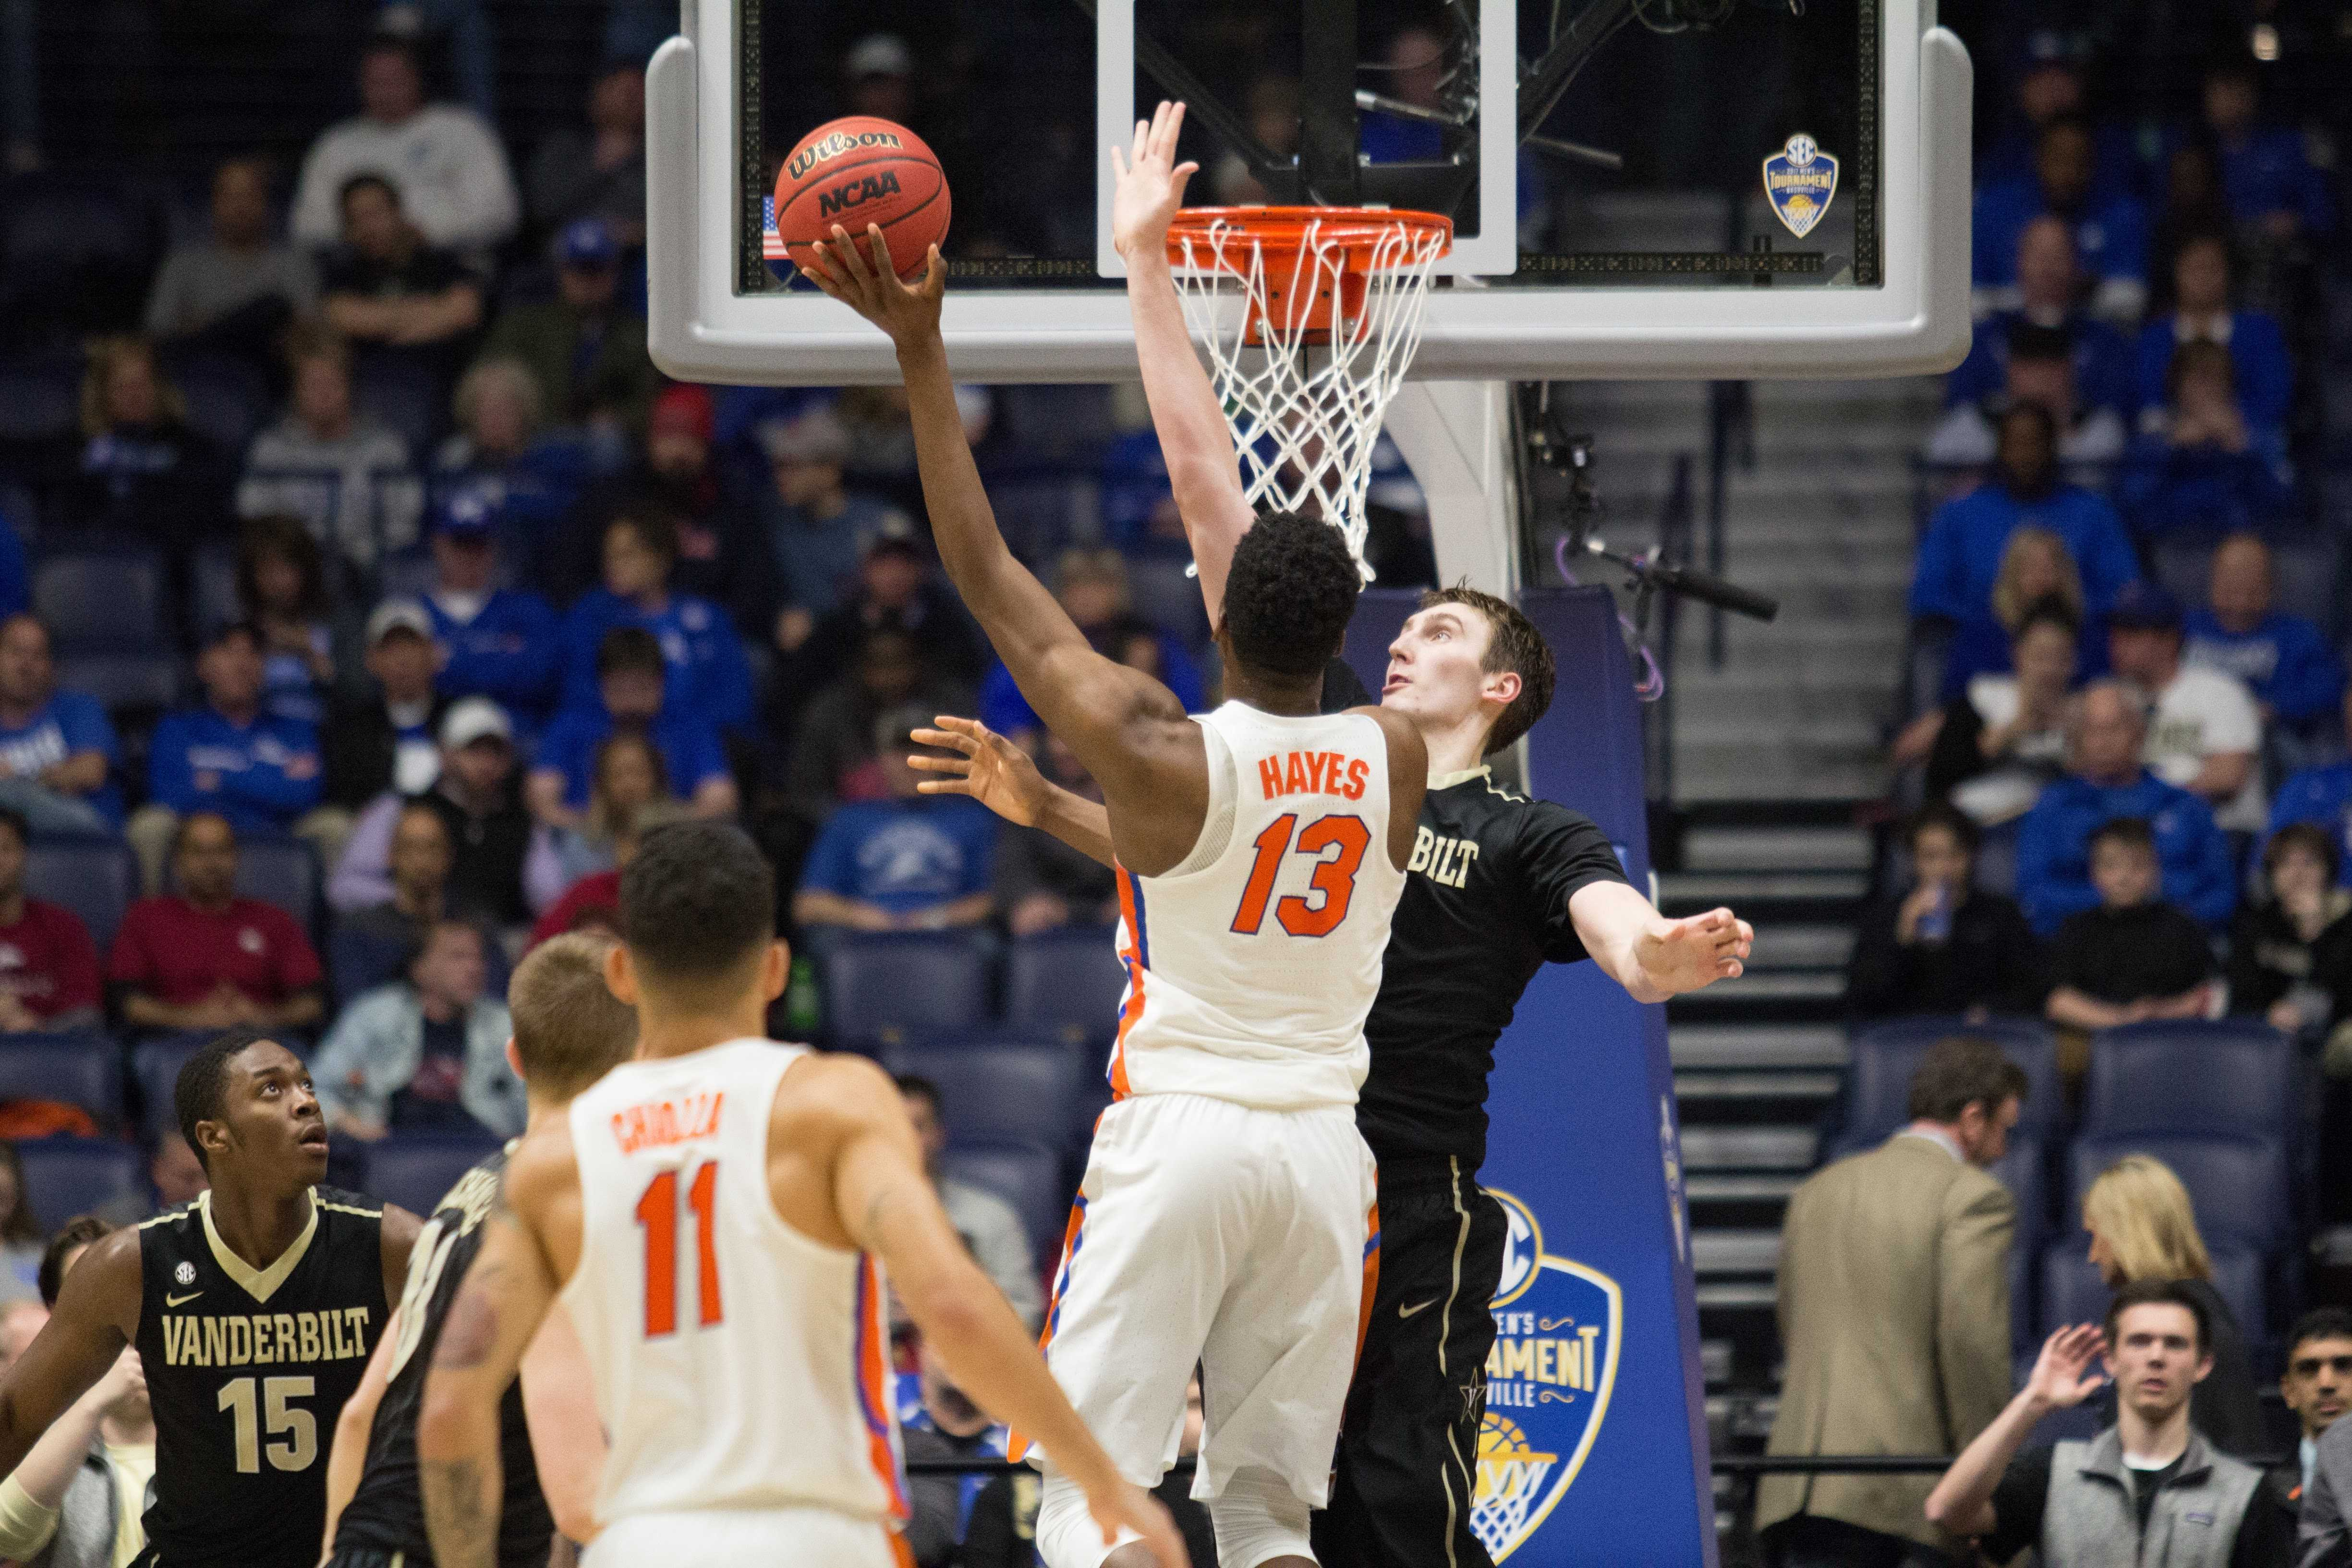 Vanderbilt center Luke Kornet defends the basket against Florida in the SEC tournament March 10, 2017 at Bridgestone Arena.